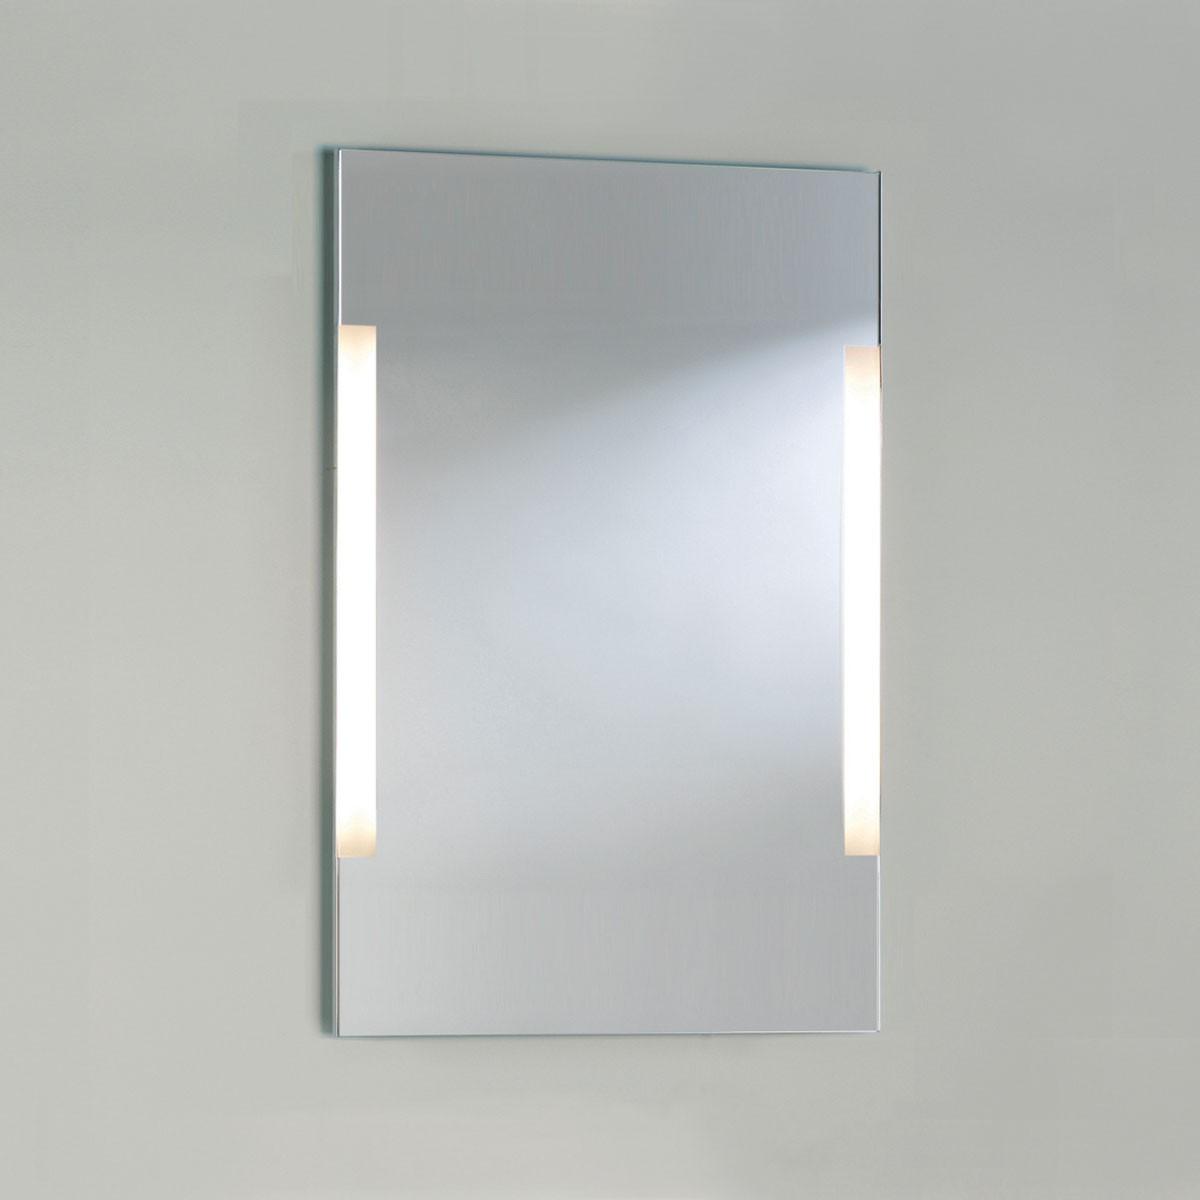 Astro Imola 900 Polished Chrome Bathroom Mirror Light at